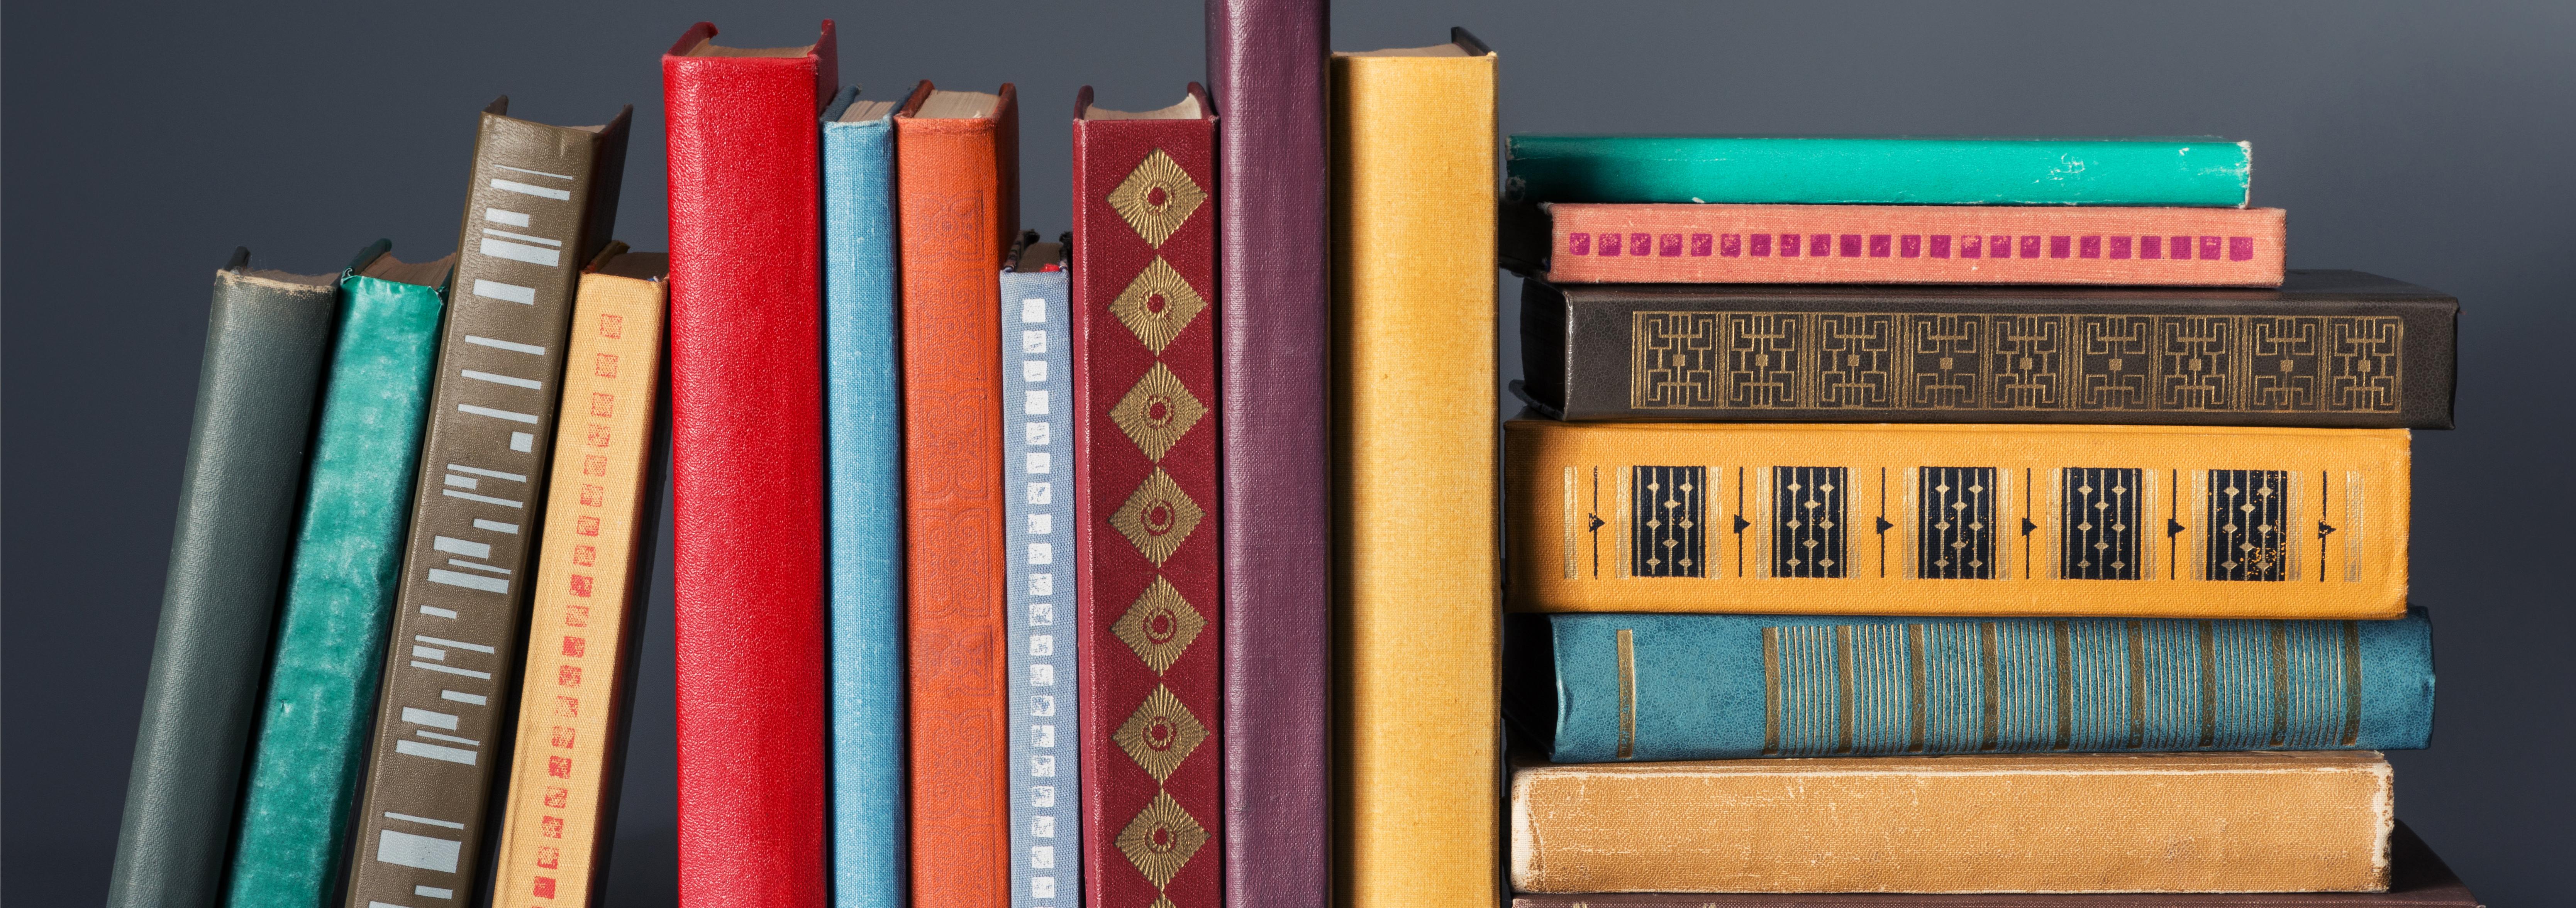 Free Photo Bookshelf